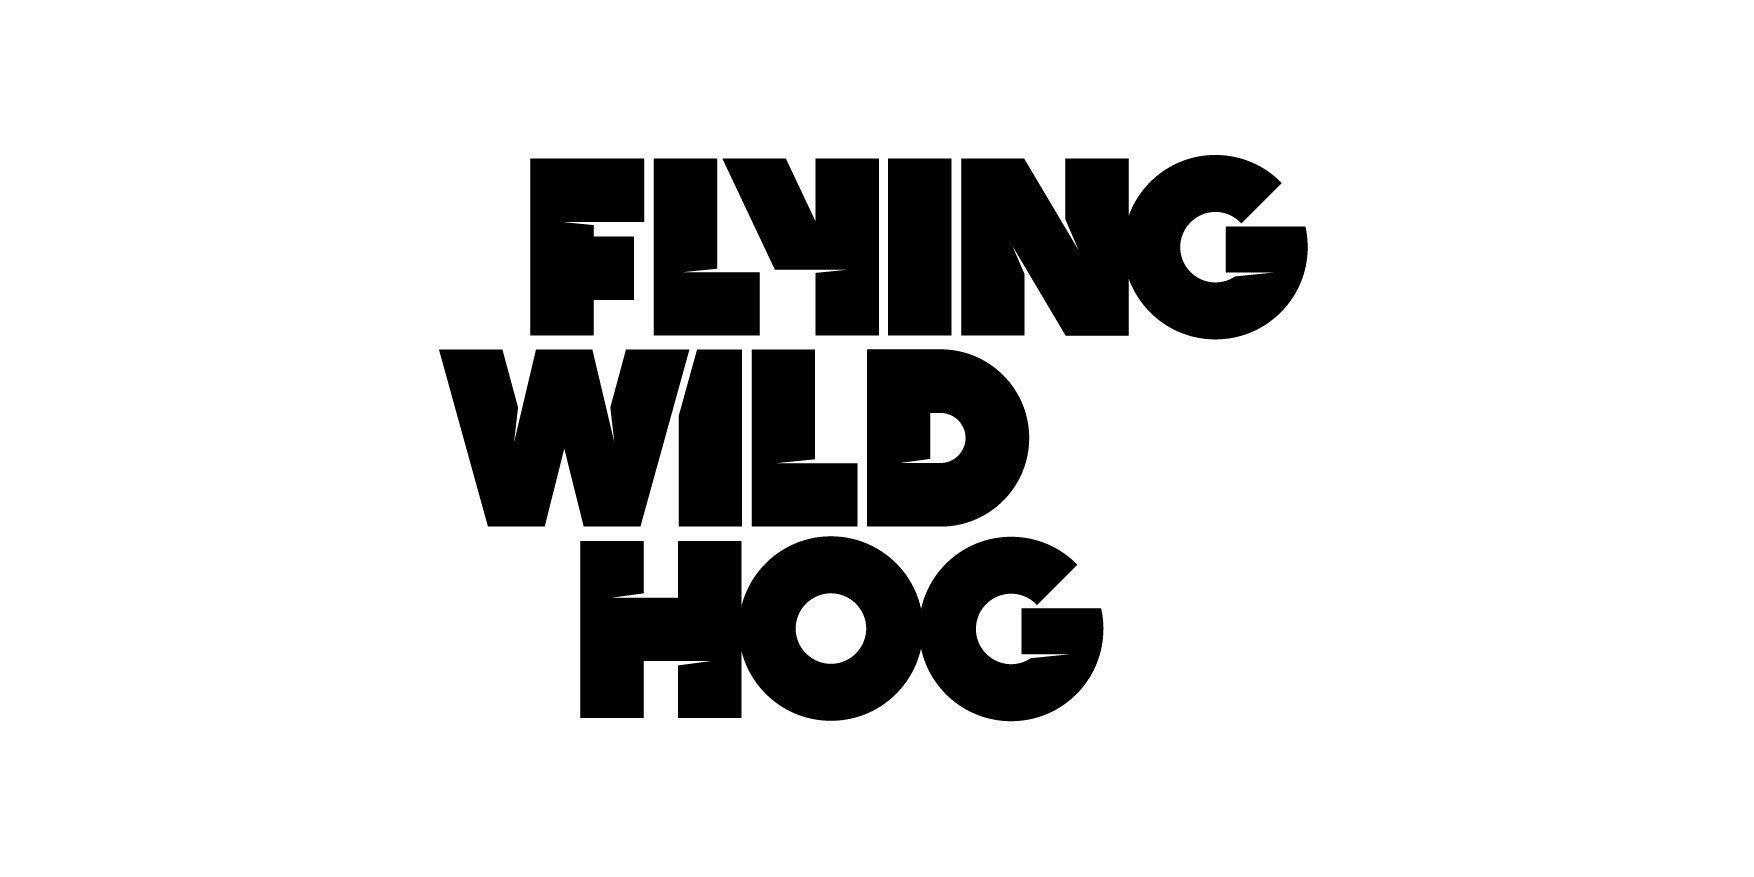 Embracer Group erwirbt Flying Wild Hog von Supernova Capital